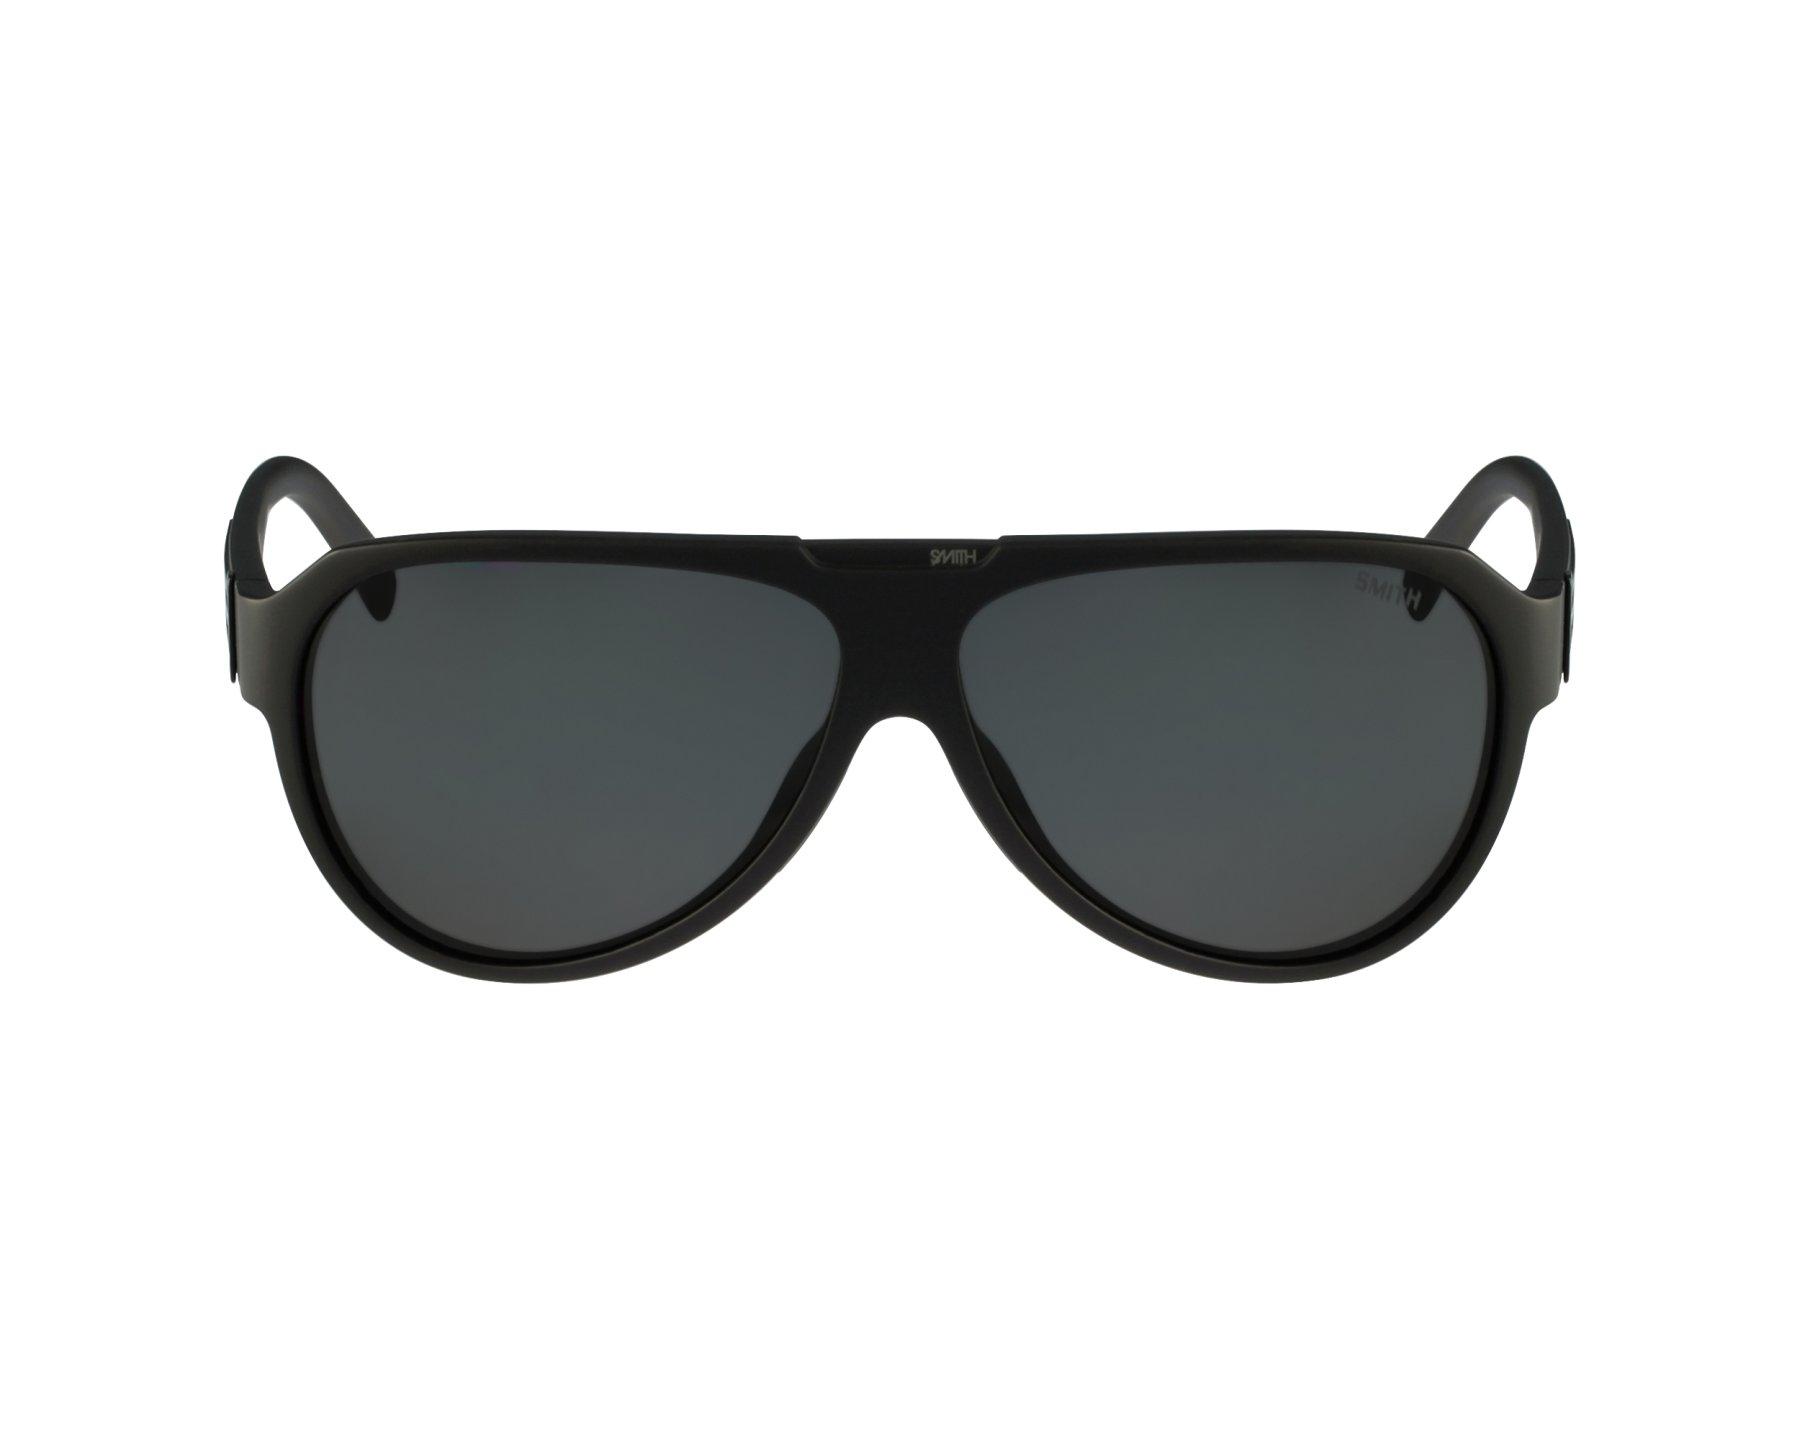 6fce1e0796ee6 Sunglasses Smith Optics Soundcheck DL53G - Black profile view